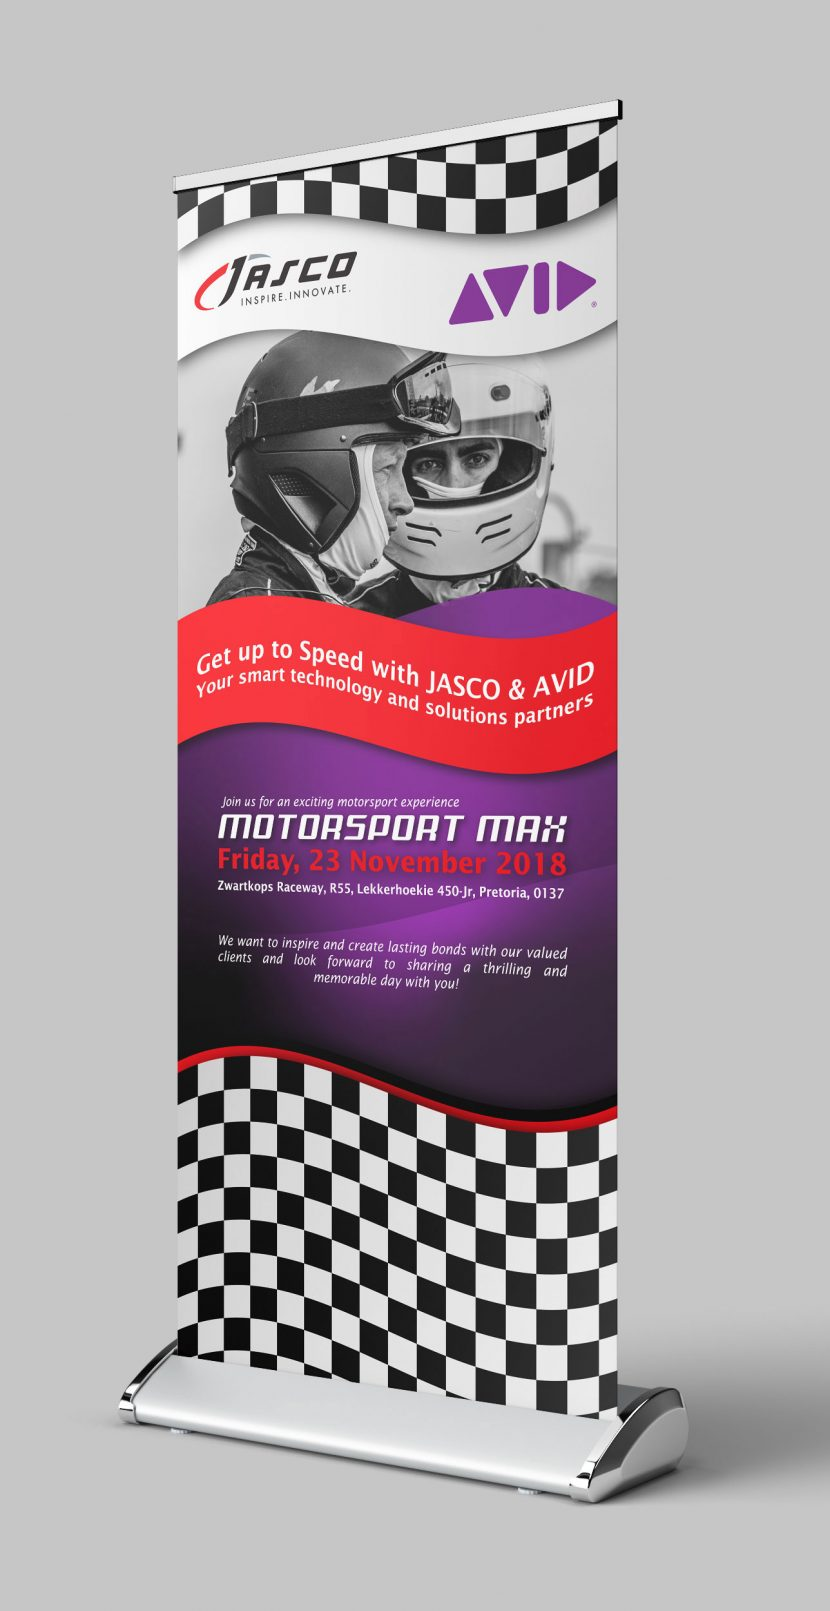 SugarLab Creative - Pull-up Banner Design - Jasco and Avid